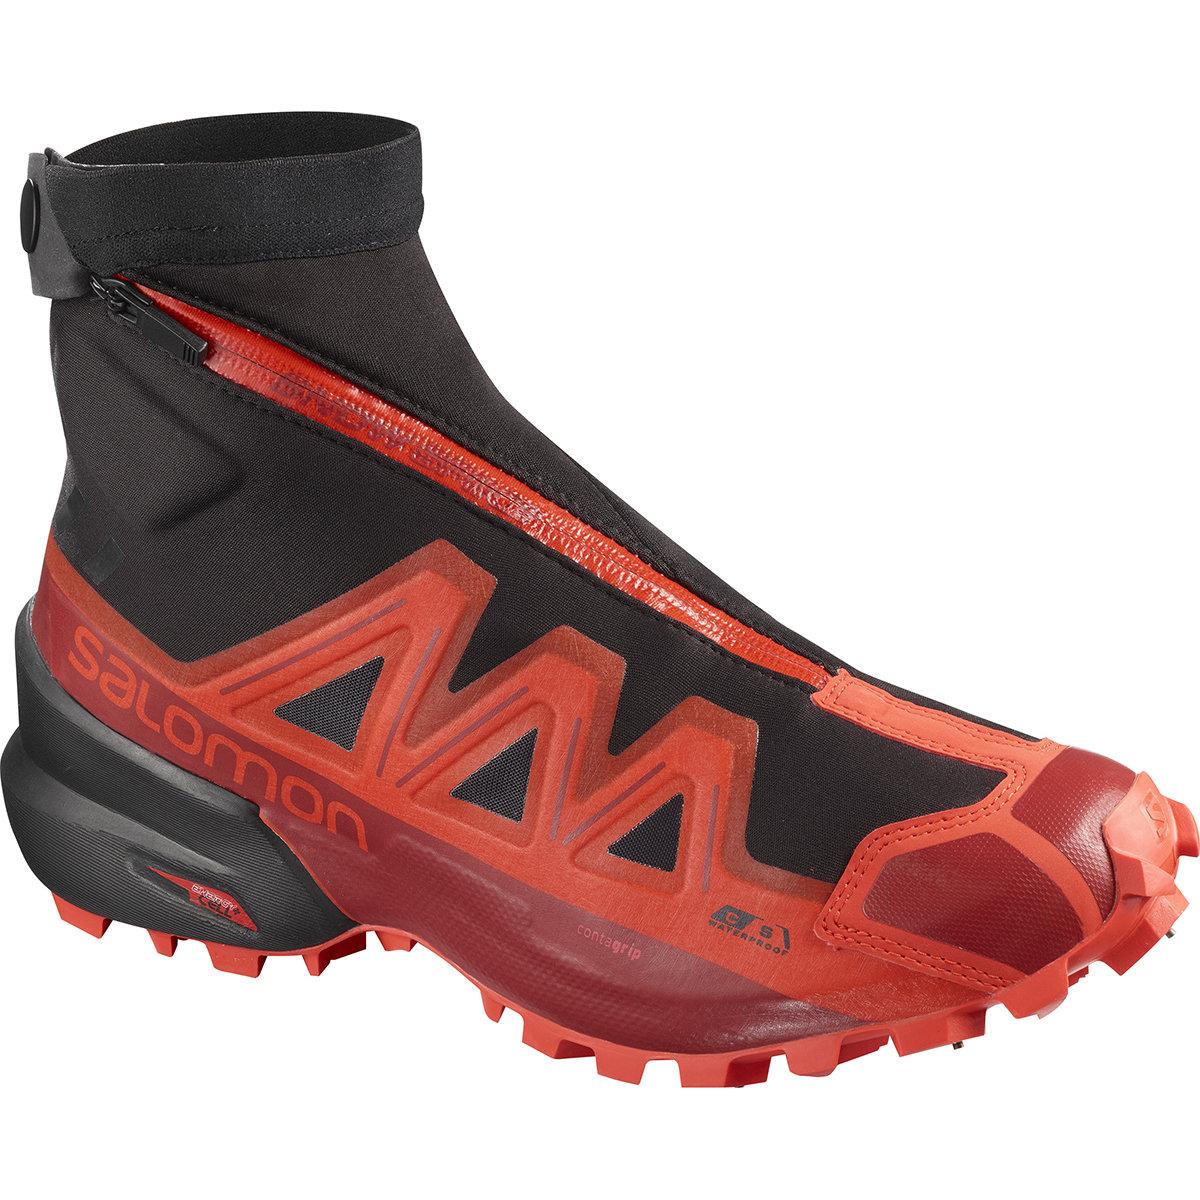 Chaussures running Salomon Snowspike Cswp Black/rd/rd Dahlia 2020